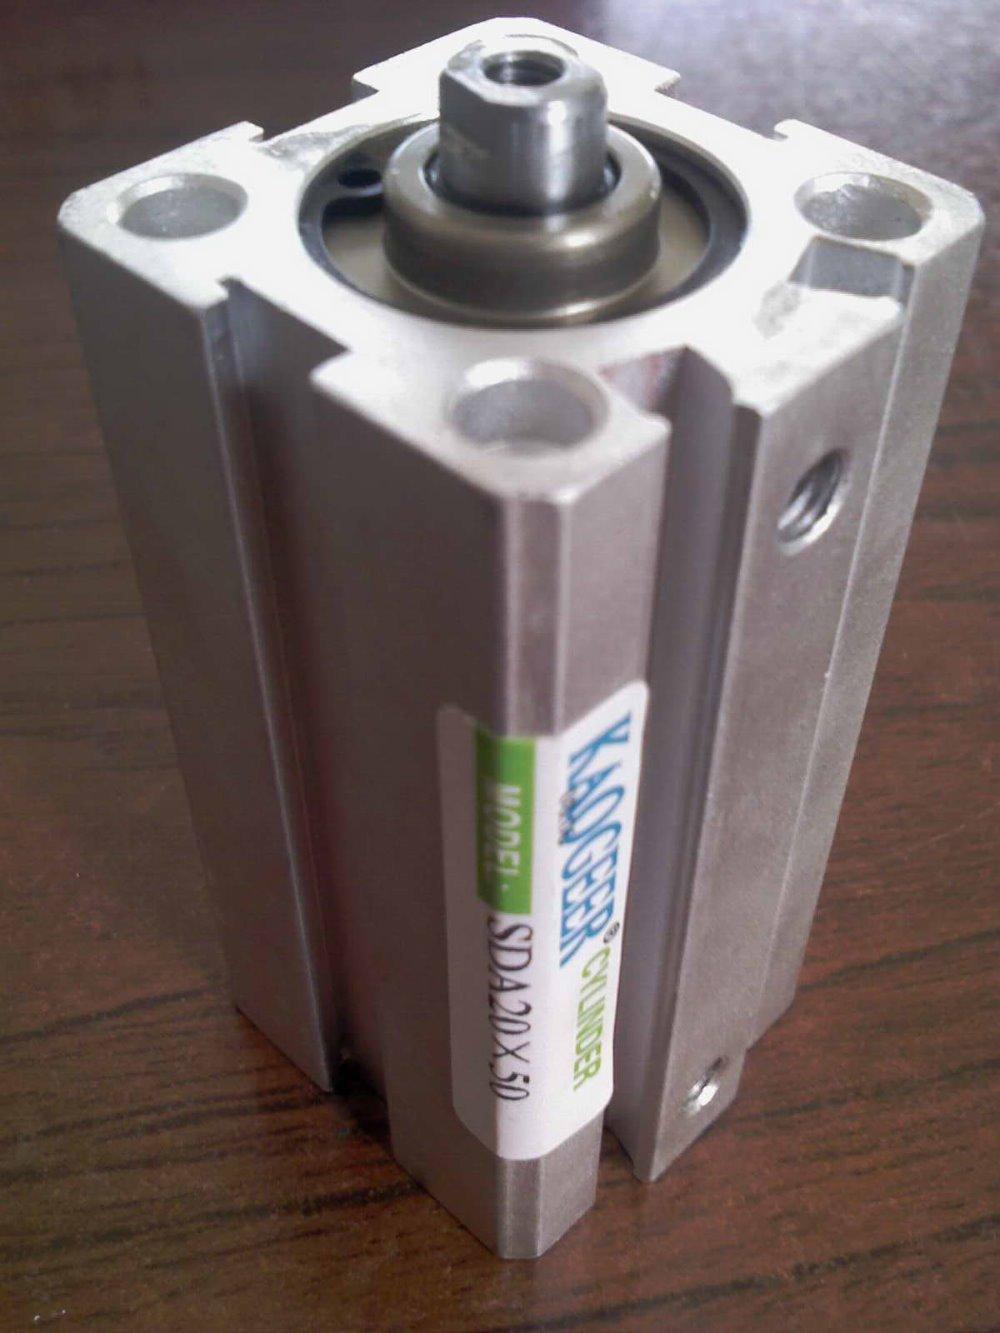 SDA Series compact Pneumatic Cylinder / air cylinder SDA25X50 SDA25X50 SDA25X60 SDA25X70 SDA25X80 SDA25X90 SDA25X100 su63 100 s airtac air cylinder pneumatic component air tools su series